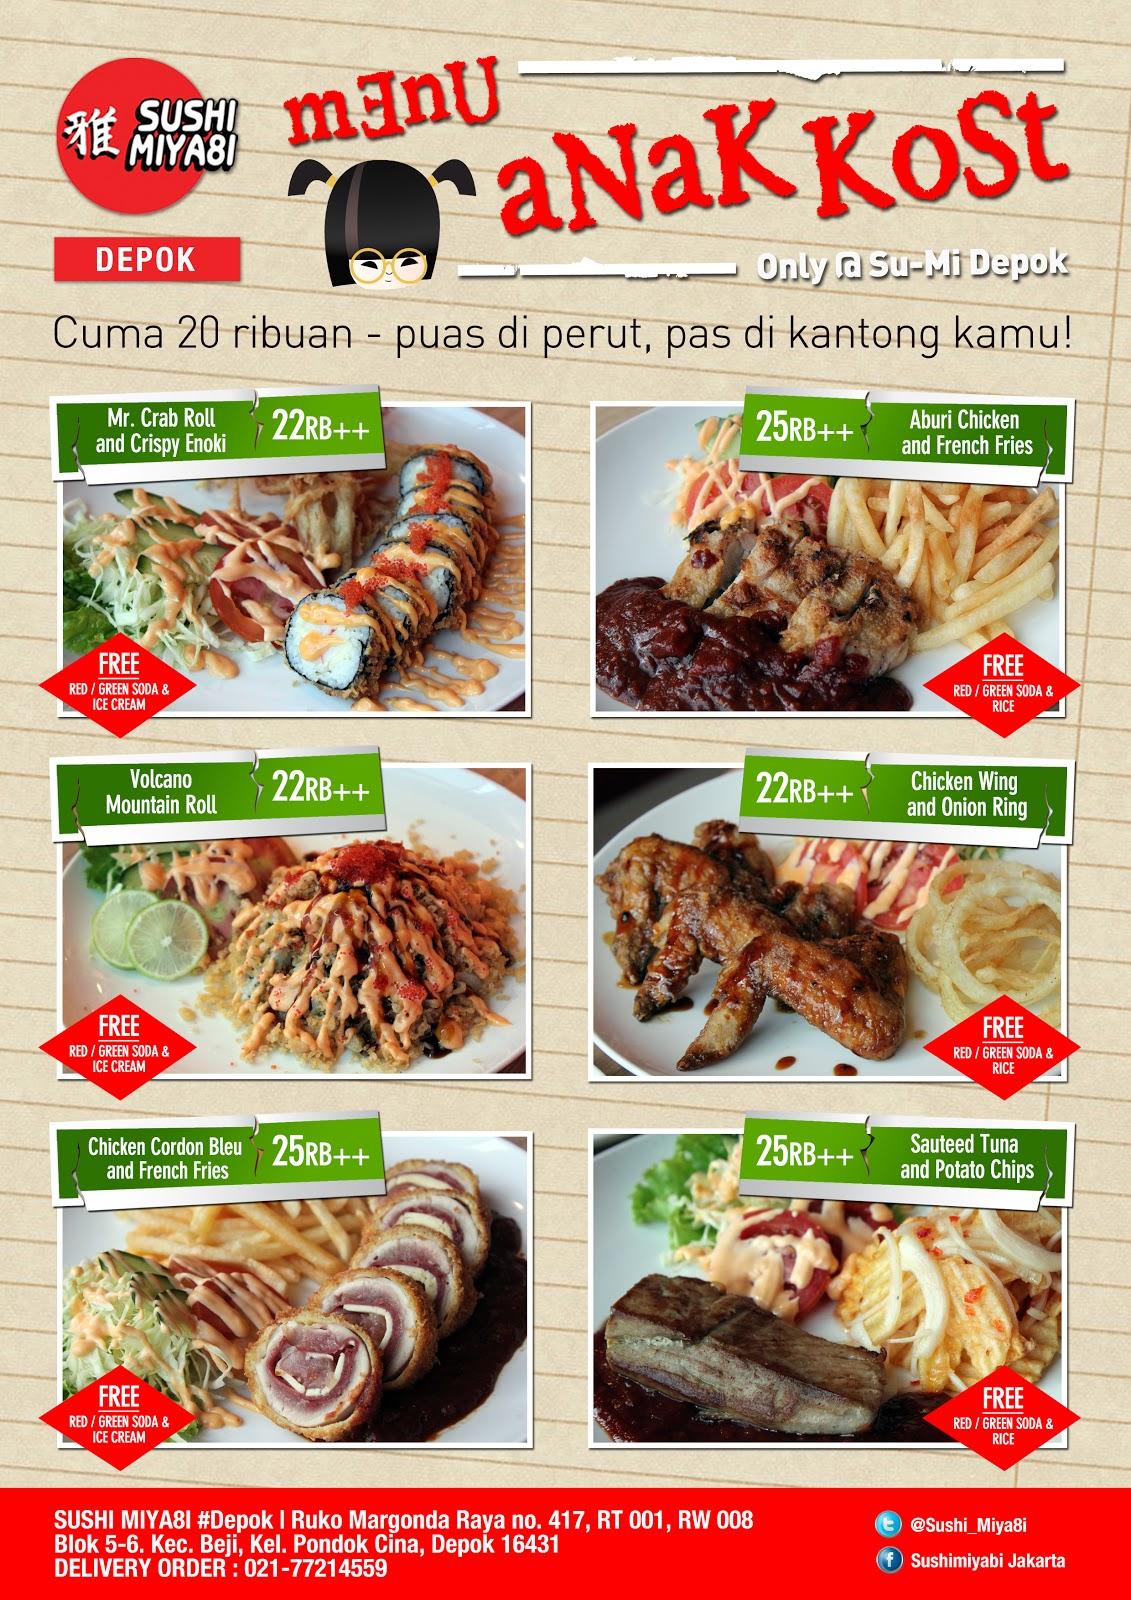 Contoh Flyer Promosi Makanan Materi Pelajaran 7